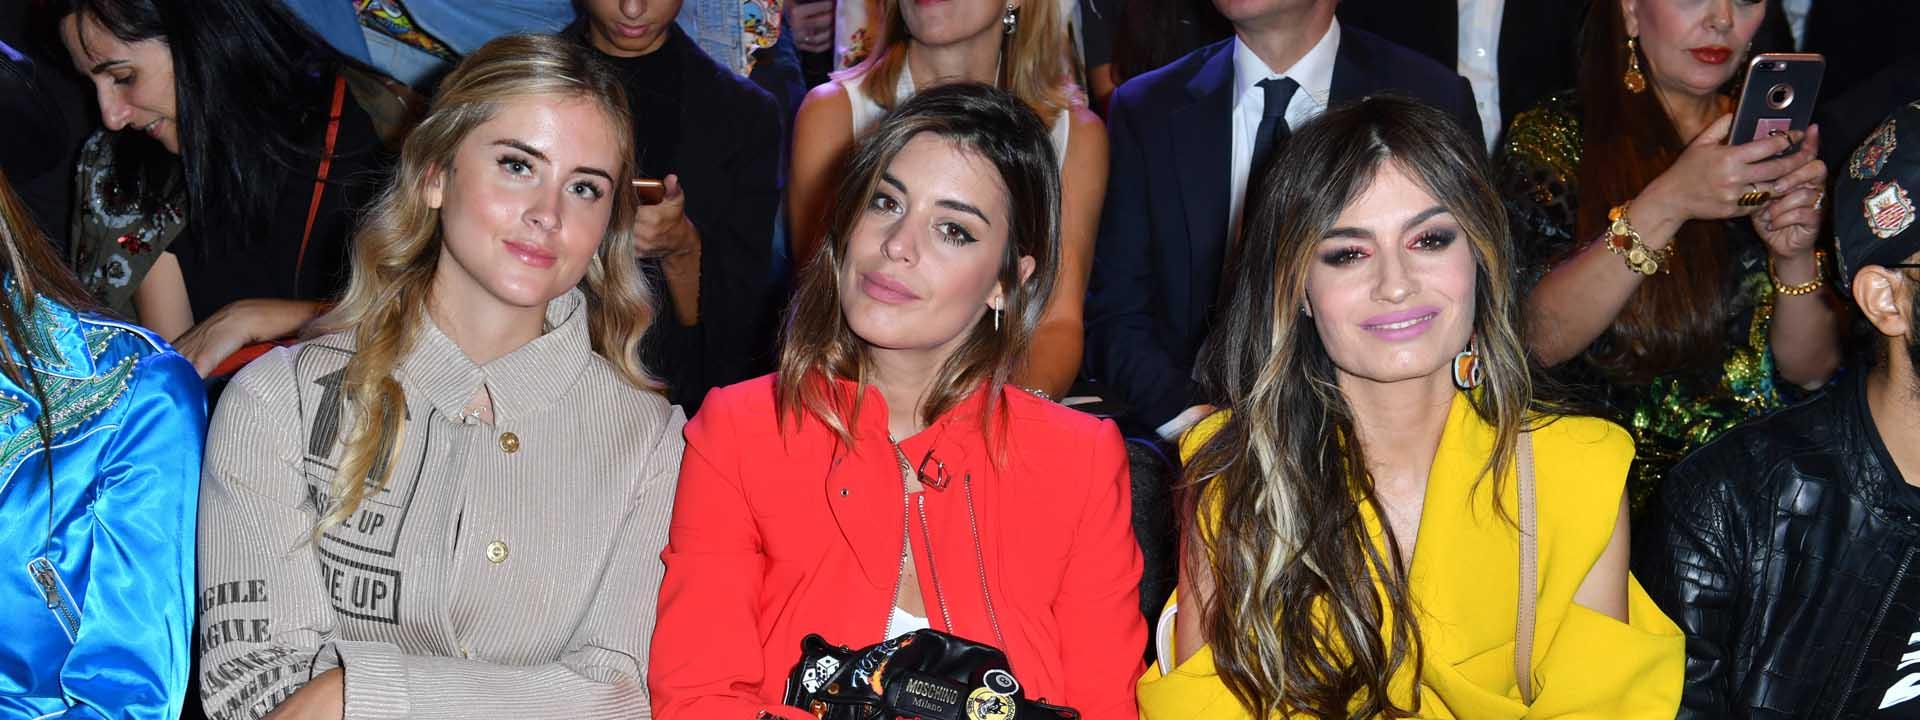 Valentina Ferragni, Aida Domenech, Angela Rozas Saiz . Moschino special guests